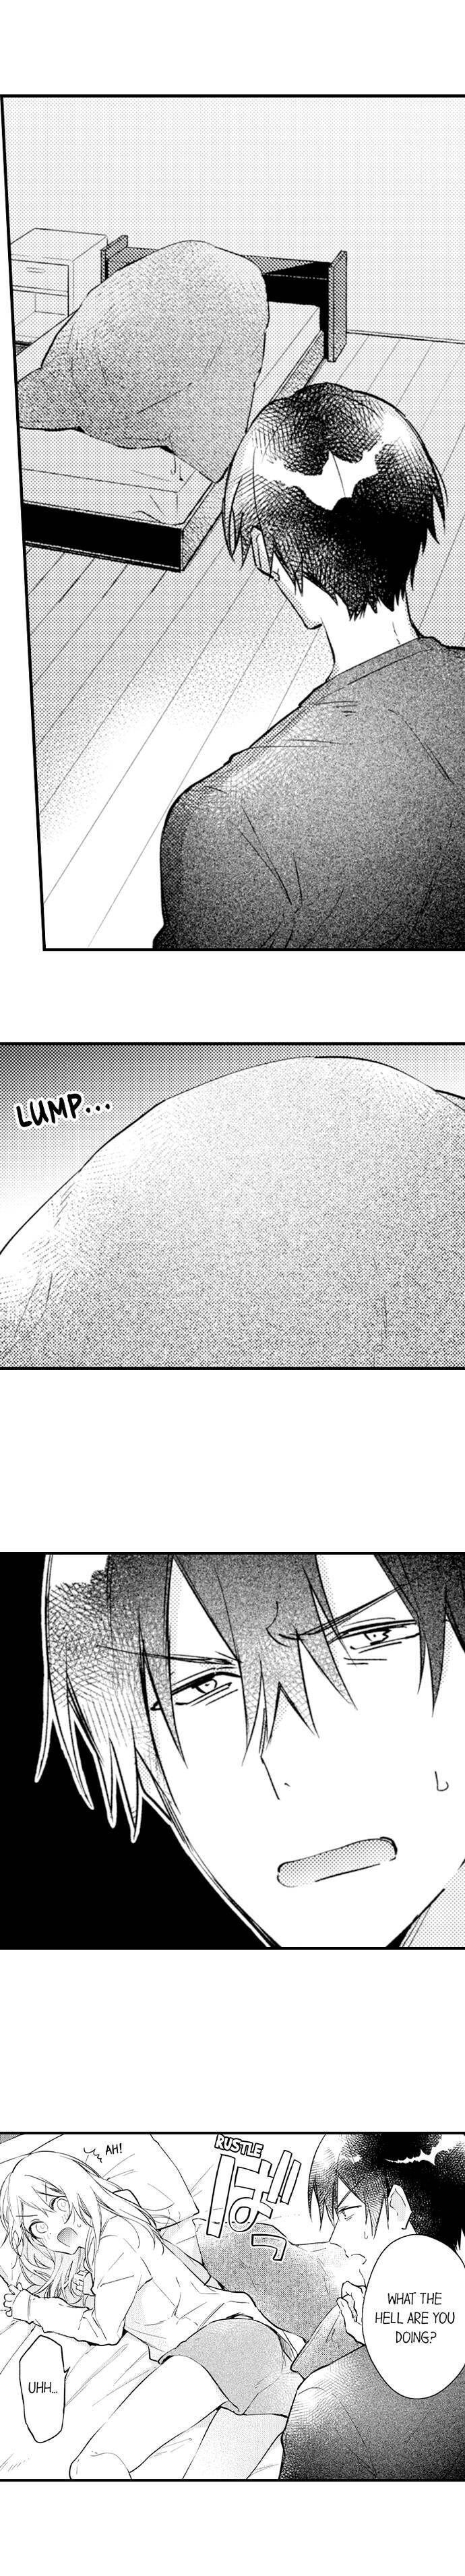 Kekkon Shitanode, Sex Yuukyuu Kudasai! Chapter 27 page 2 - Mangakakalots.com